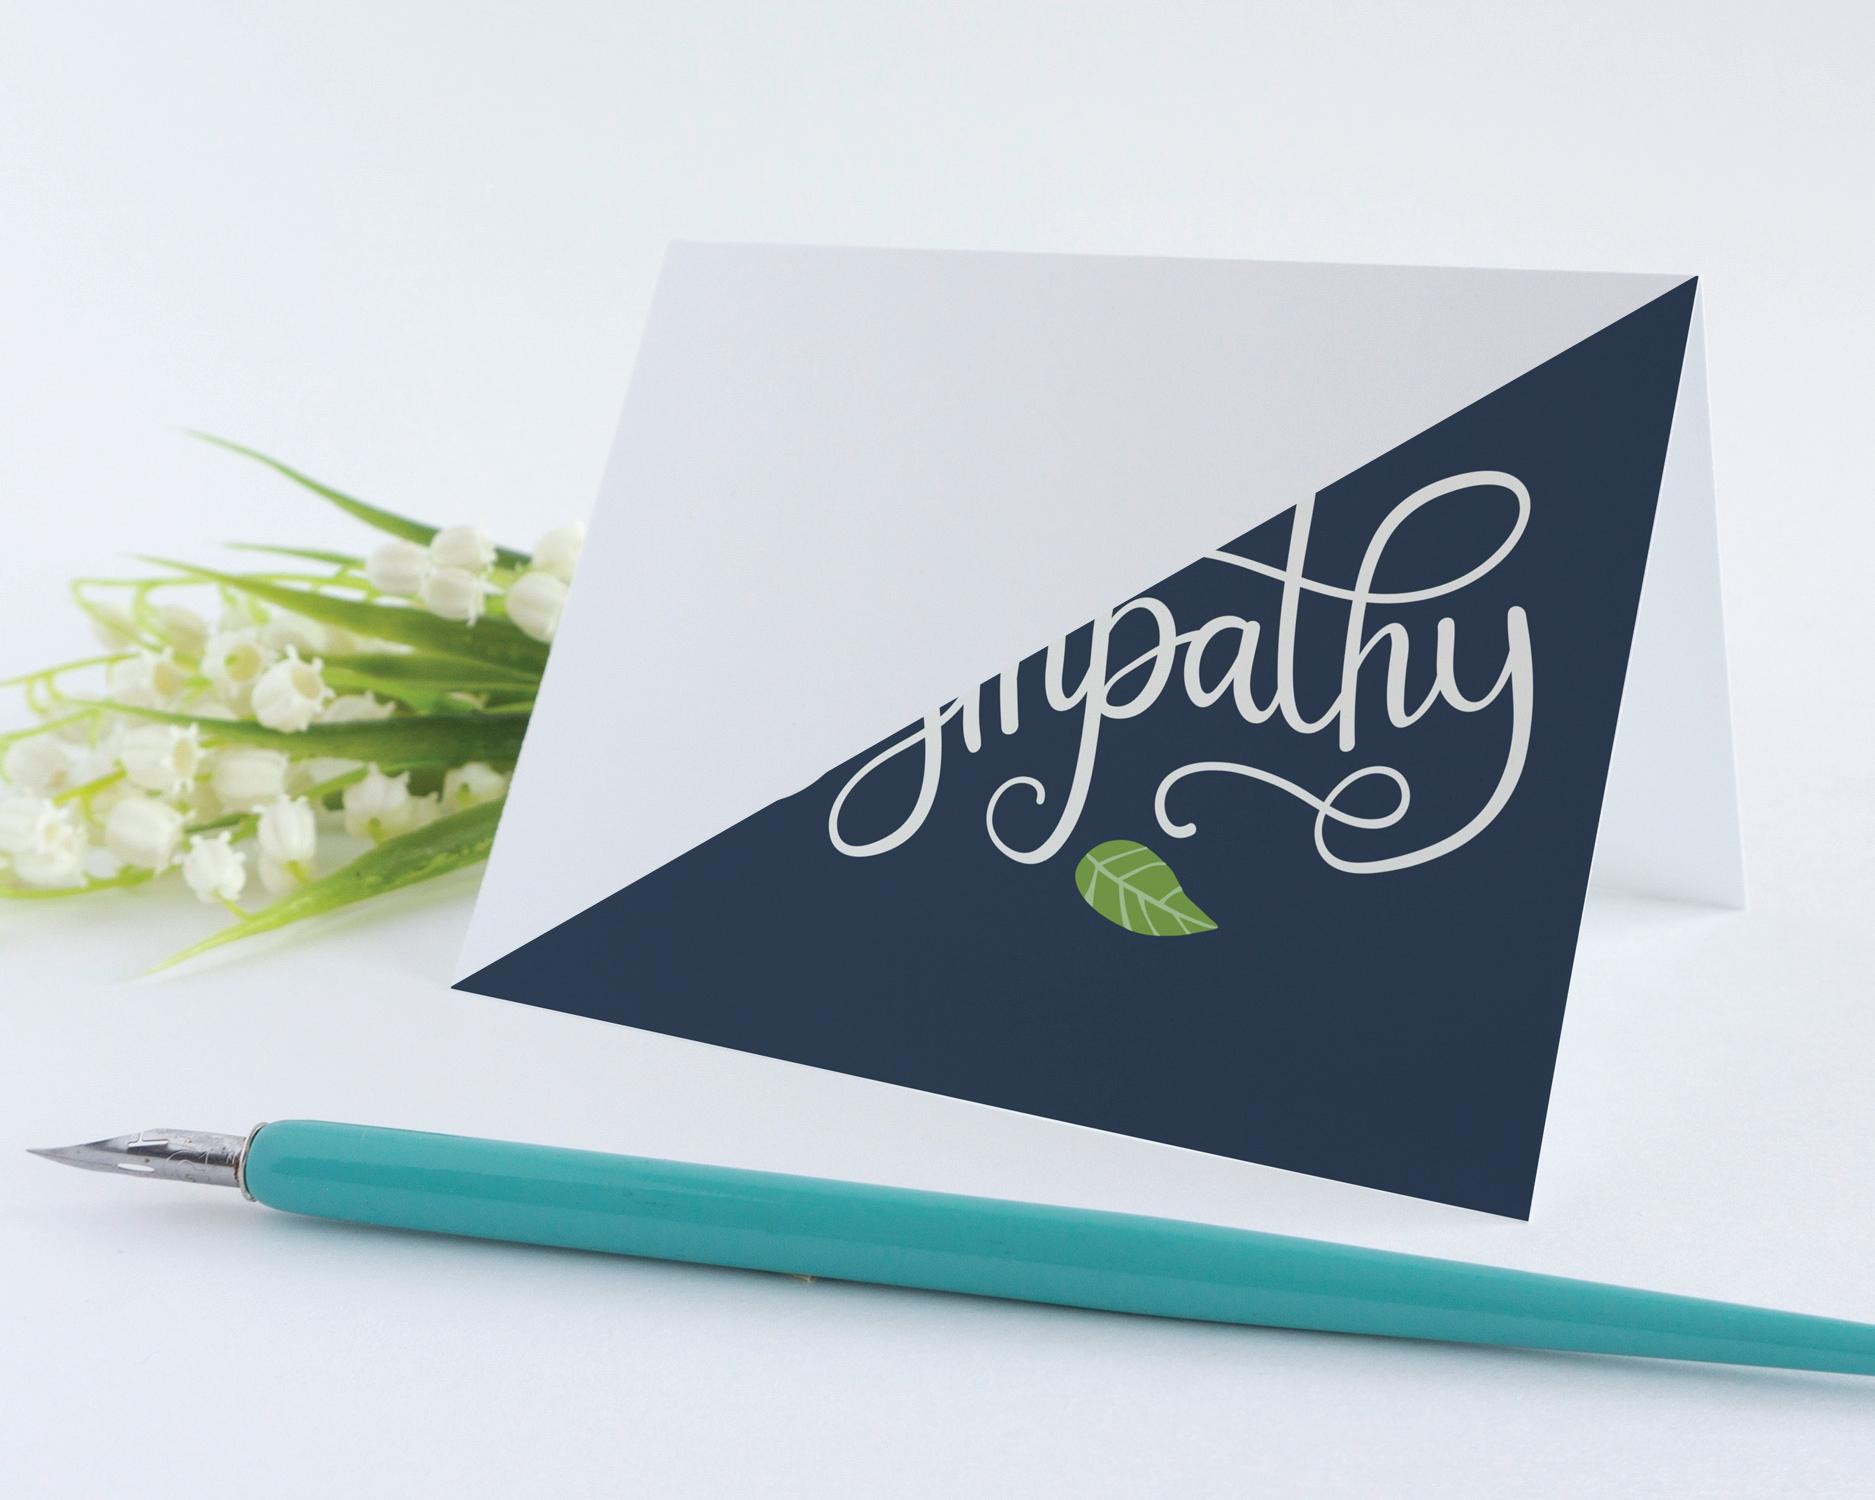 Final-Horizontal-leaves-and-ink.jpg